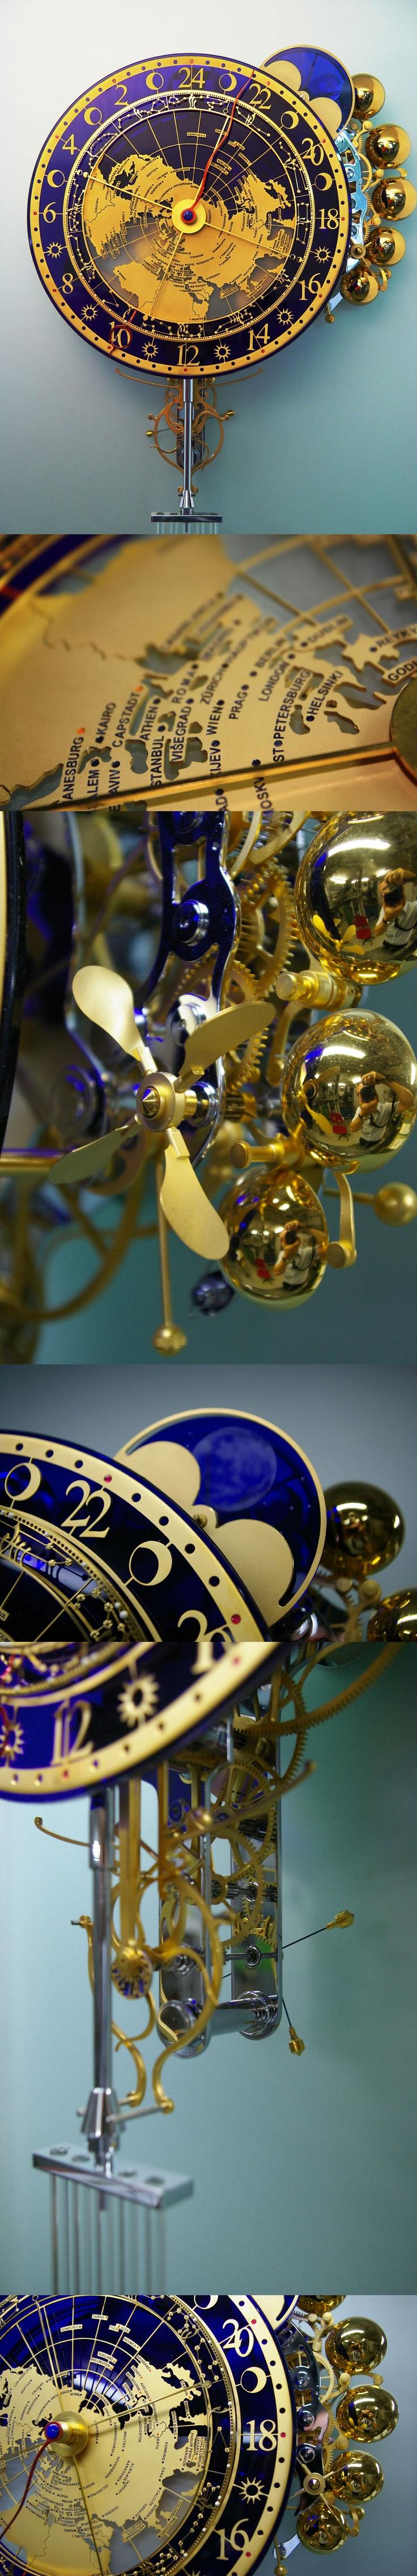 The Worldtime by Miki Eleta, diz as horas e detalhes astrológicos